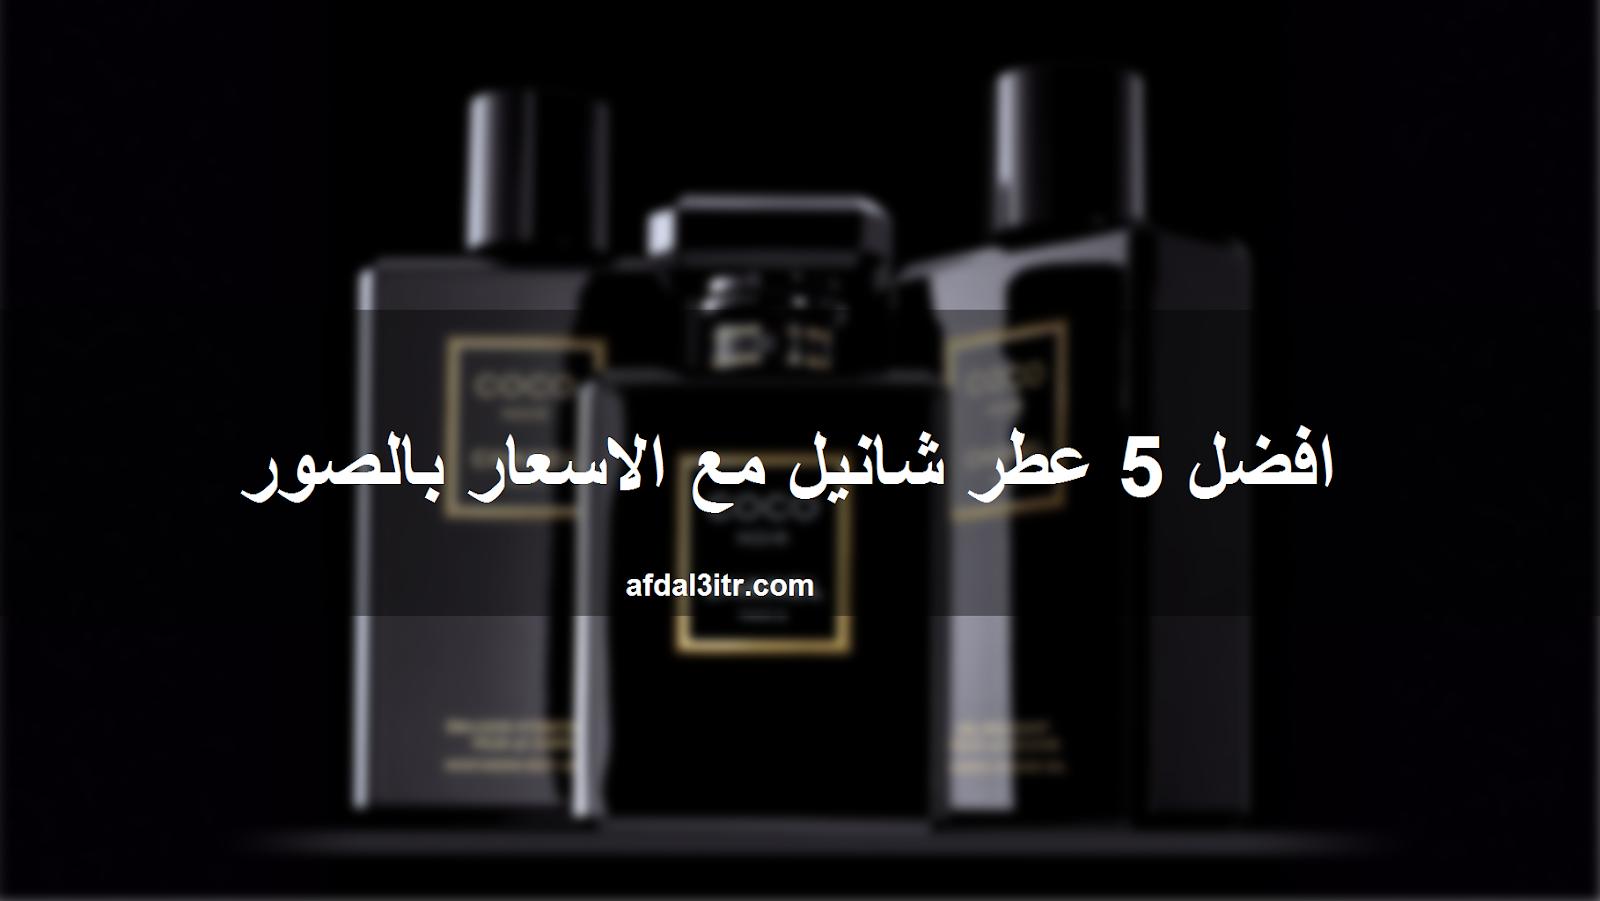 5f9cb4ab0 افضل 5 عطر شانيل مع الاسعار بالصور - دليلك لاختيار افضل عطر